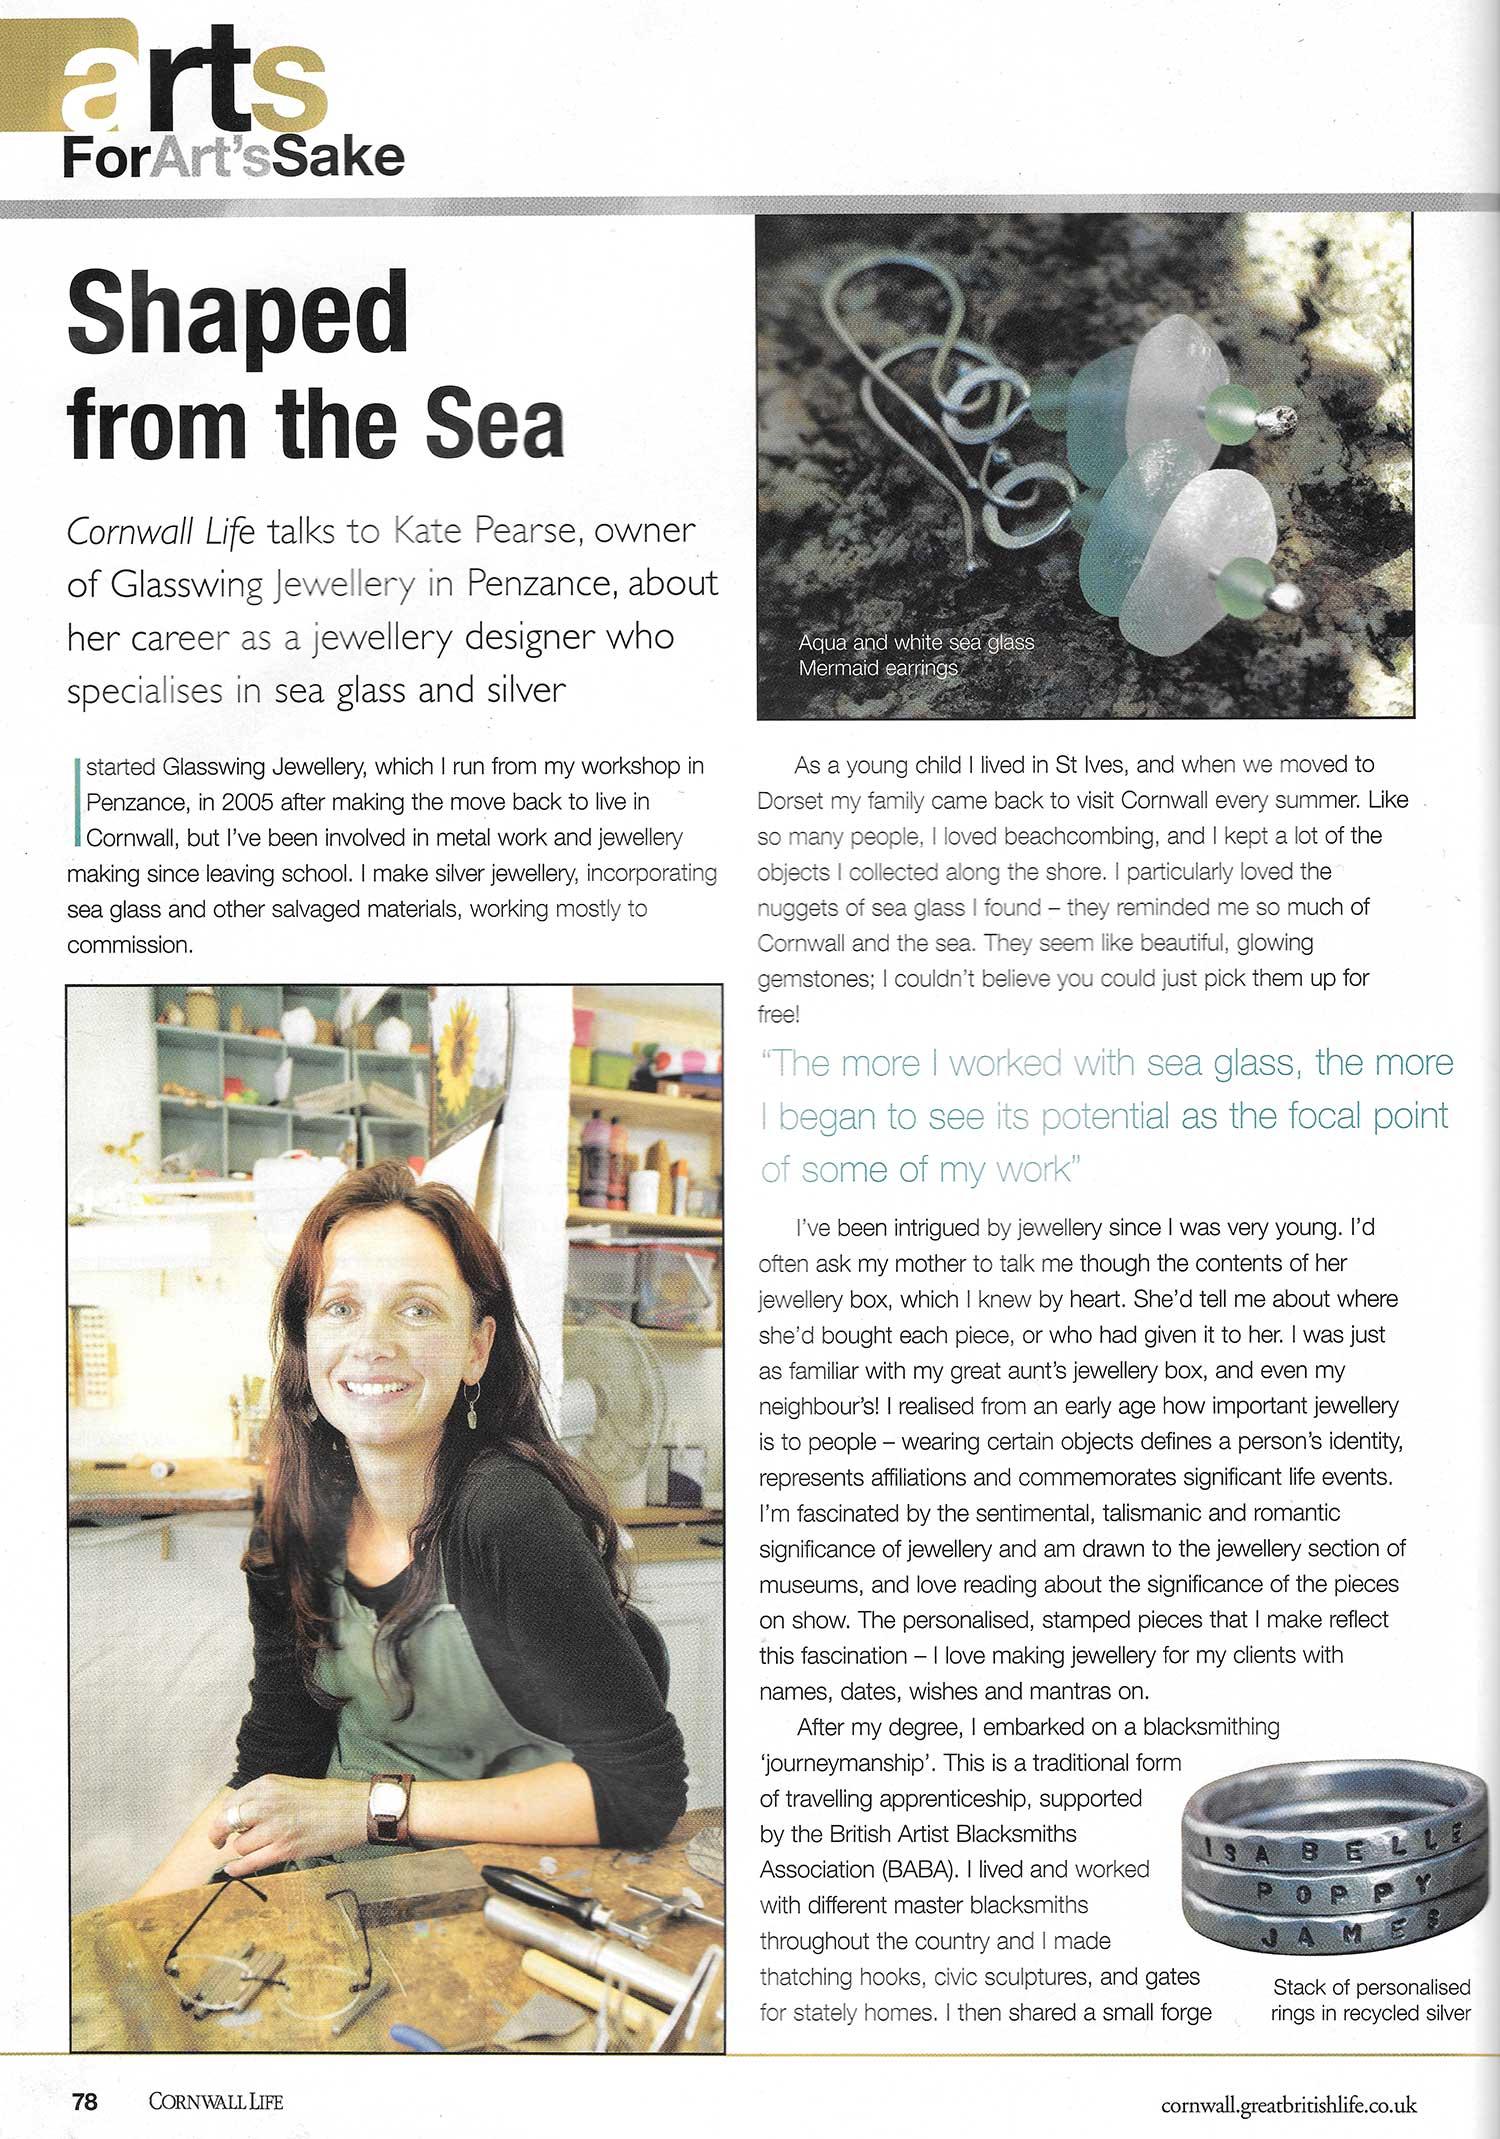 glasswing-jewellery-cornwall-life-magazine-01.jpg